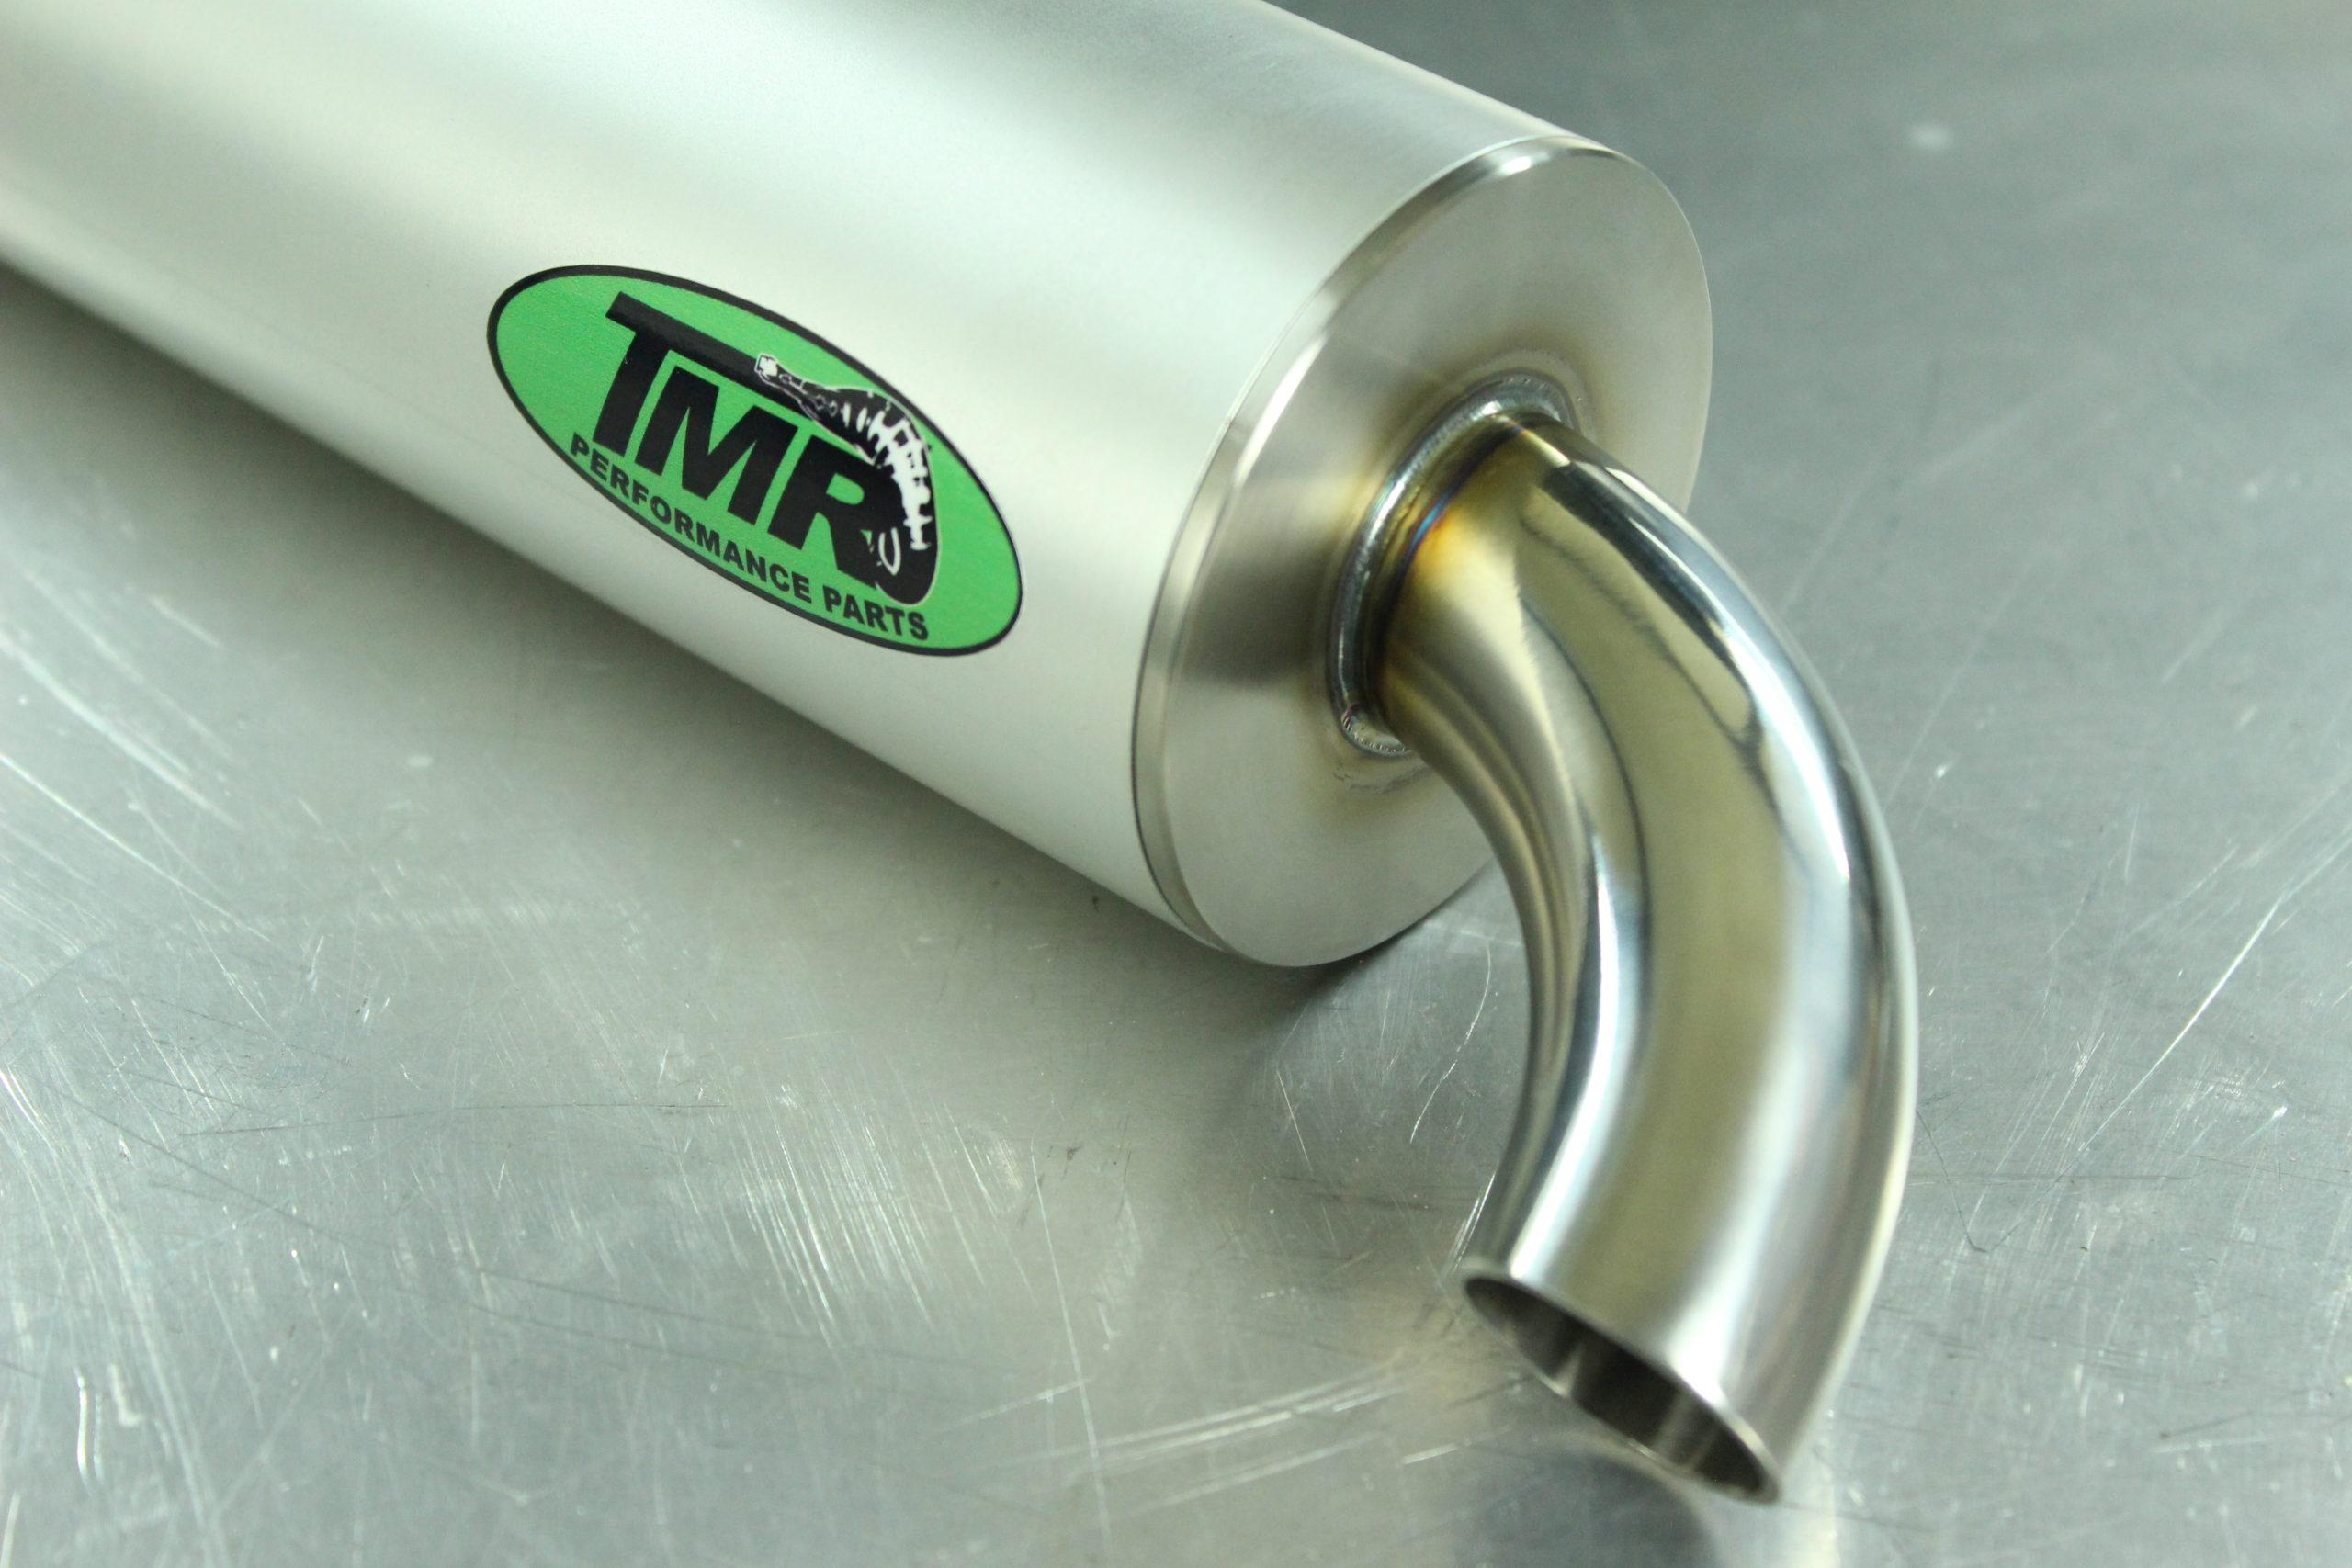 TMR Performance Parts - Endschalldämpfer Endrohr - Gillera Piaggio Maxi Scooter 2